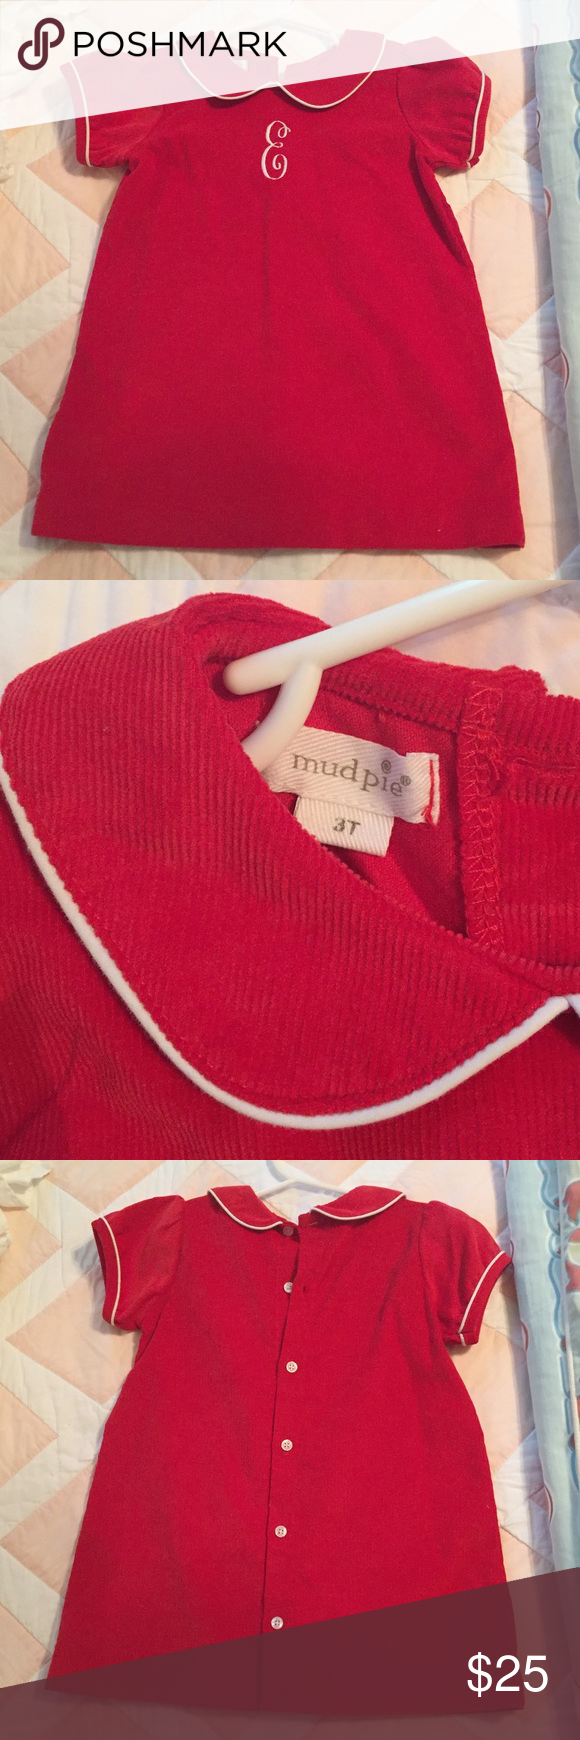 0446891e7 Jurken Mud Pie Baby Girls Red Corduroy Christmas Dress White Piping Peter  Pan Collar